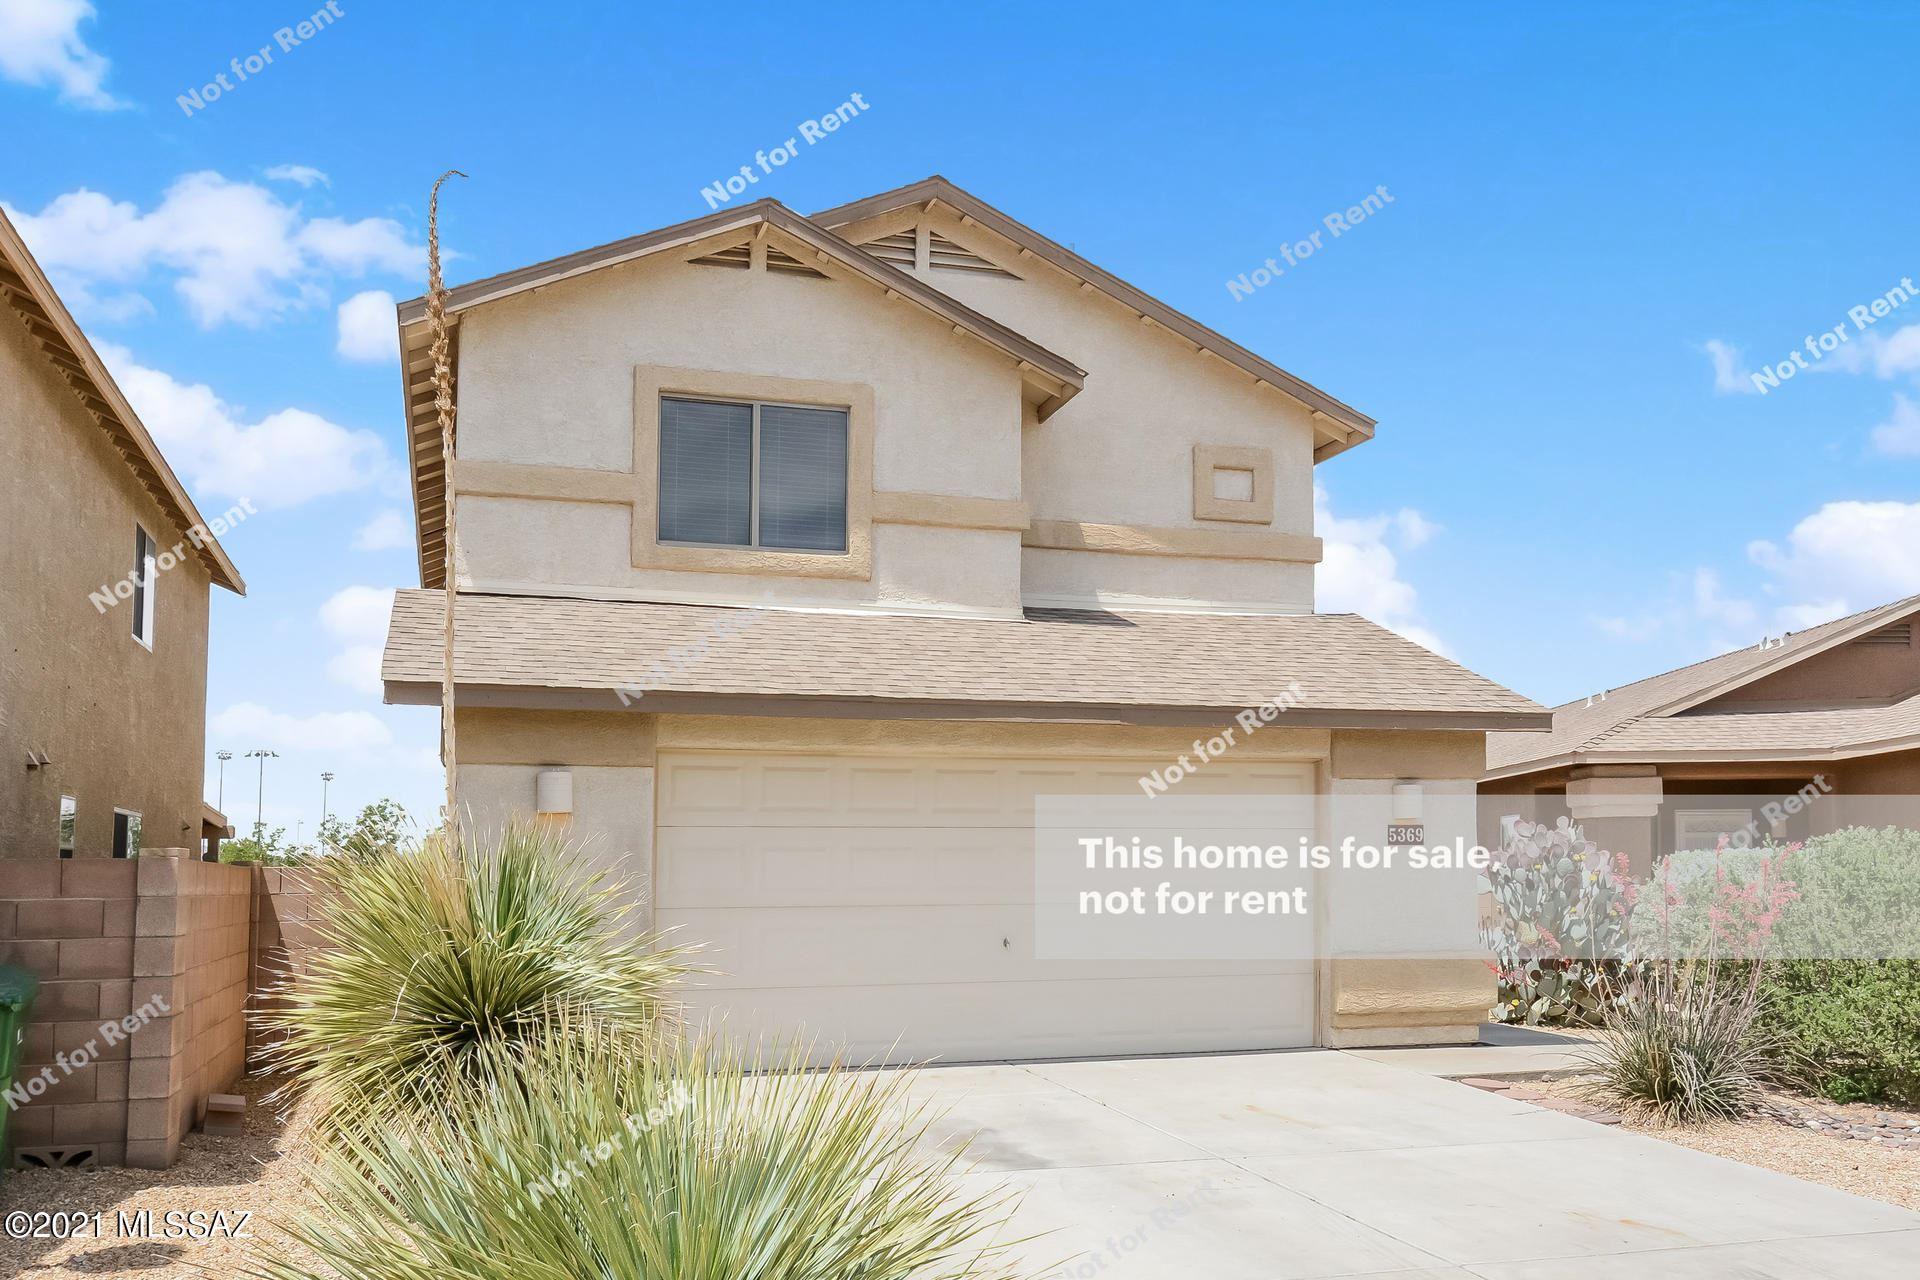 5369 N Crowley Lane, Tucson, AZ 85705 - MLS#: 22111848